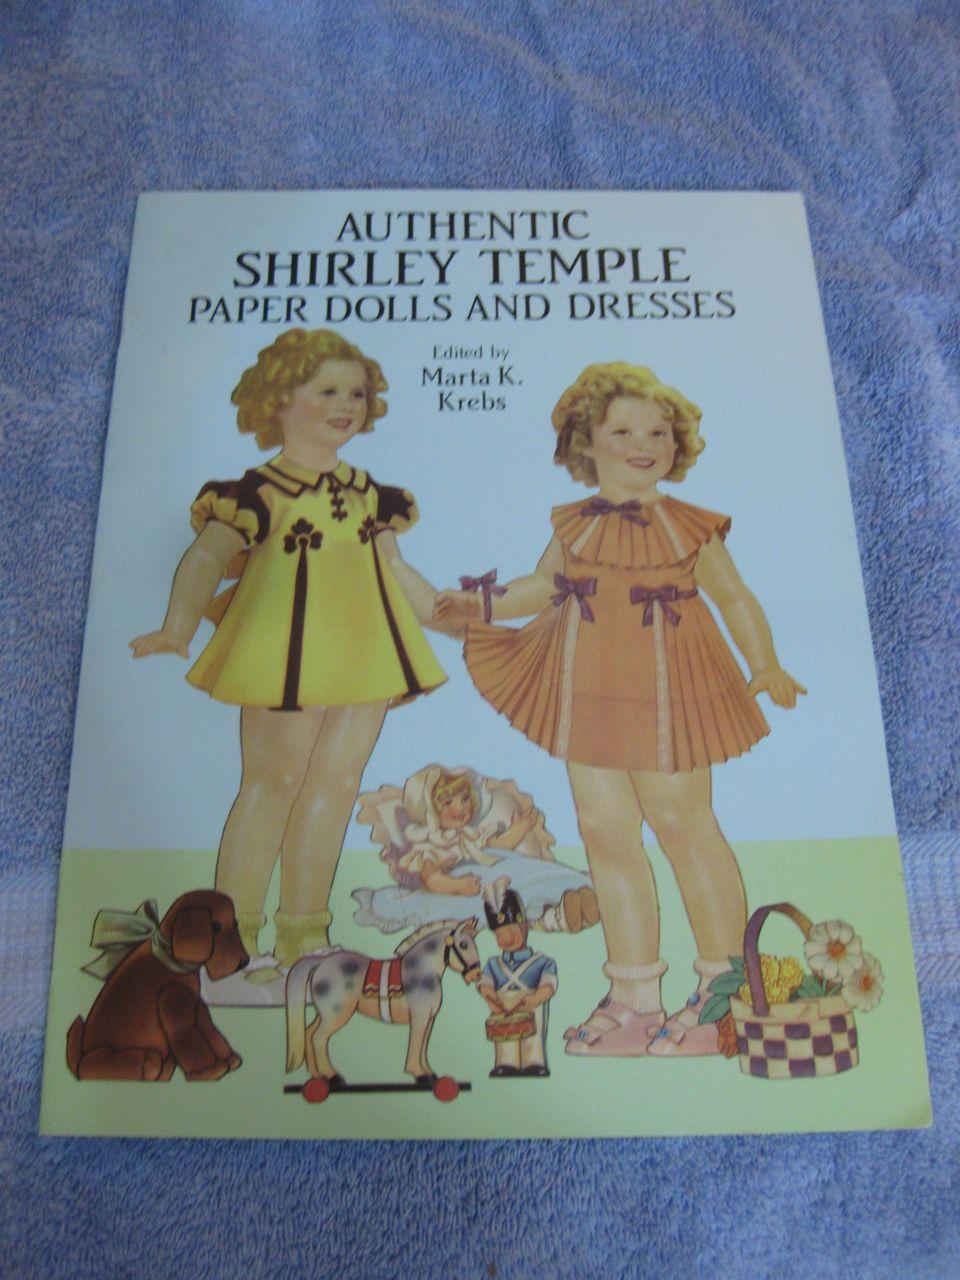 Original Shirley Temple Paper Dolls in full color,Classic Shirley Temple Paper Dolls in full color,   Authentic Shirley Temple Paper Dolls and Dresses